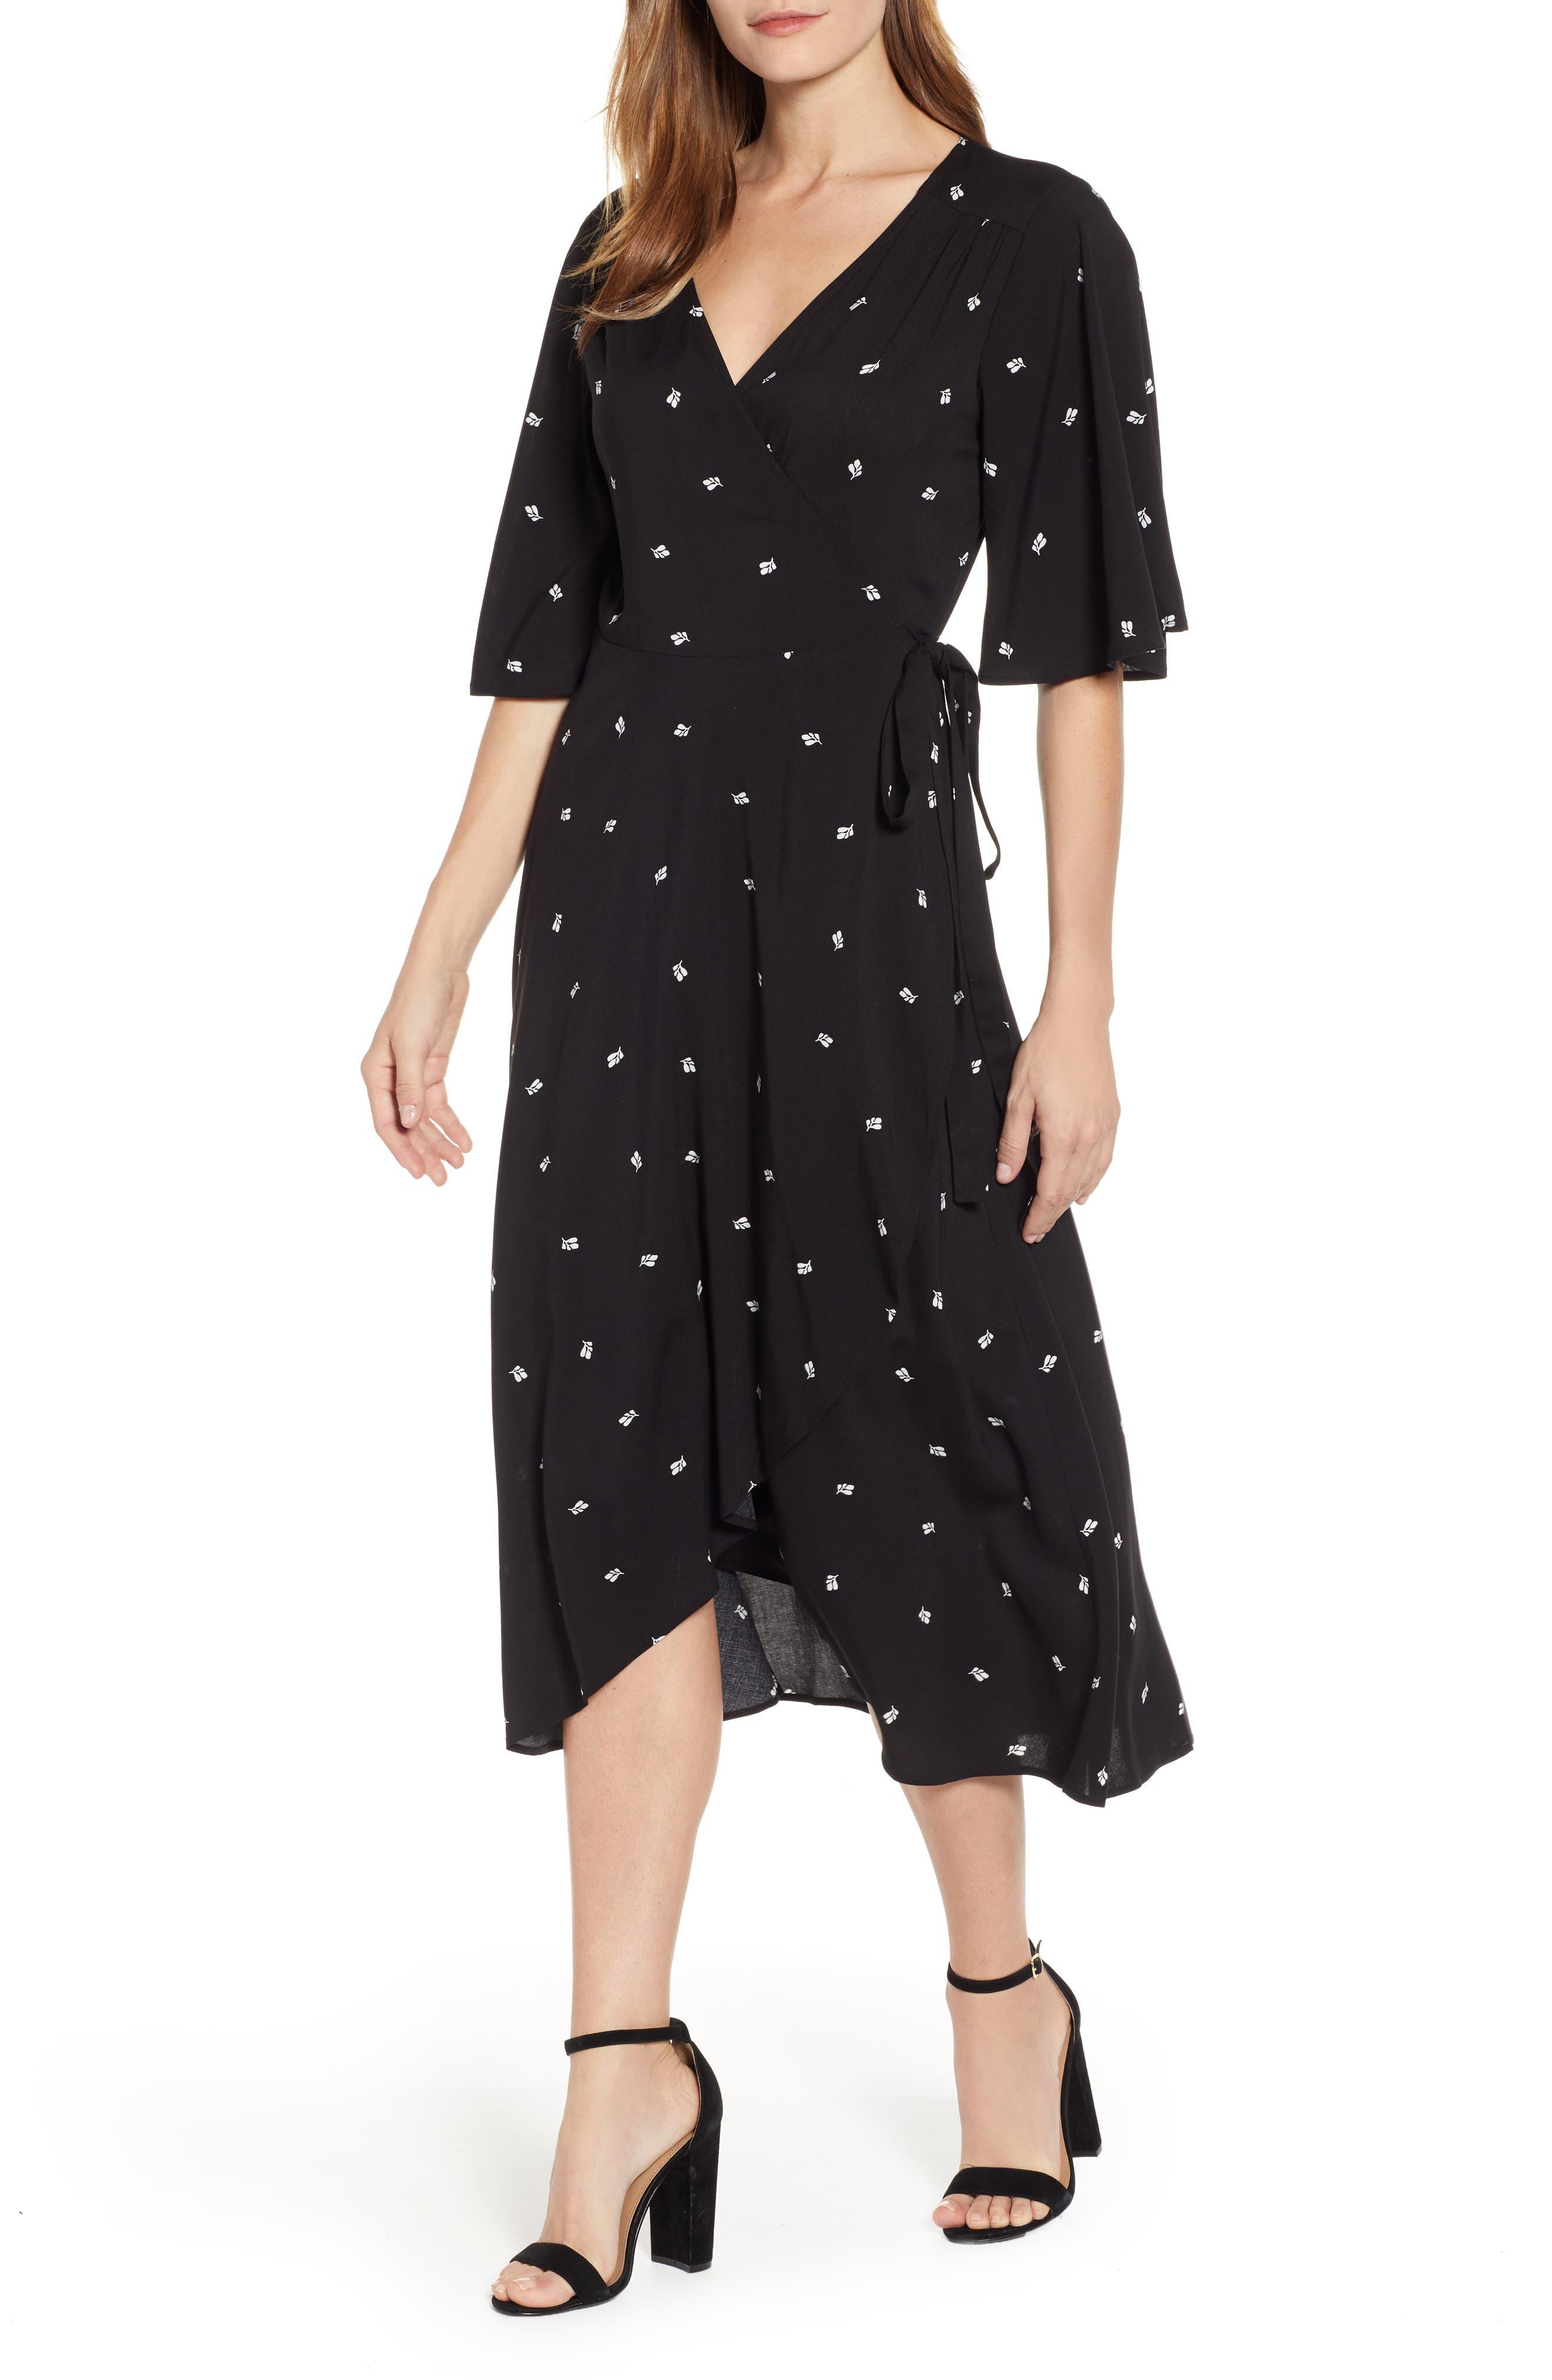 BOBEAU Orna High/Low Wrap Dress, Main, color, BLACK LEAF PRINT